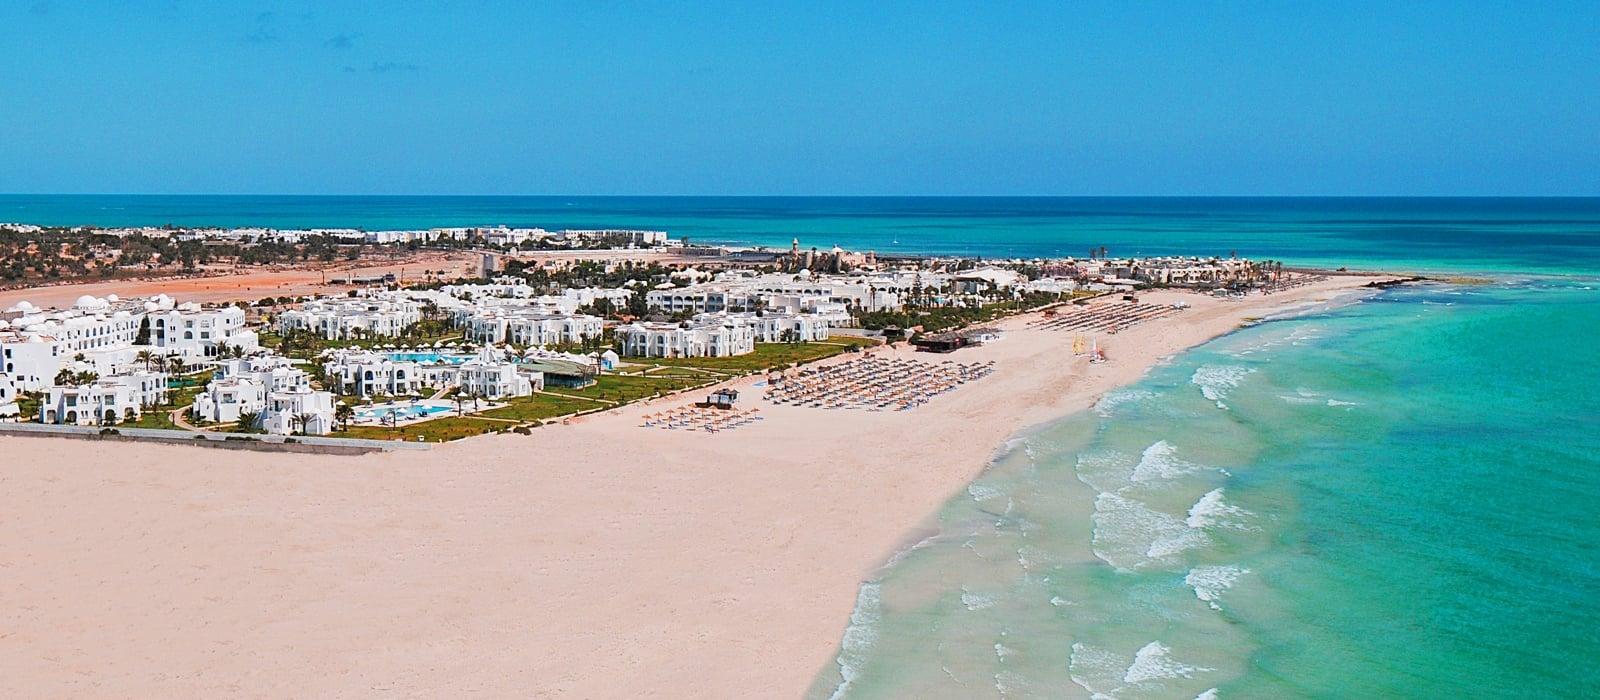 Hotels In Djerba Tunisia Vincci Hotels